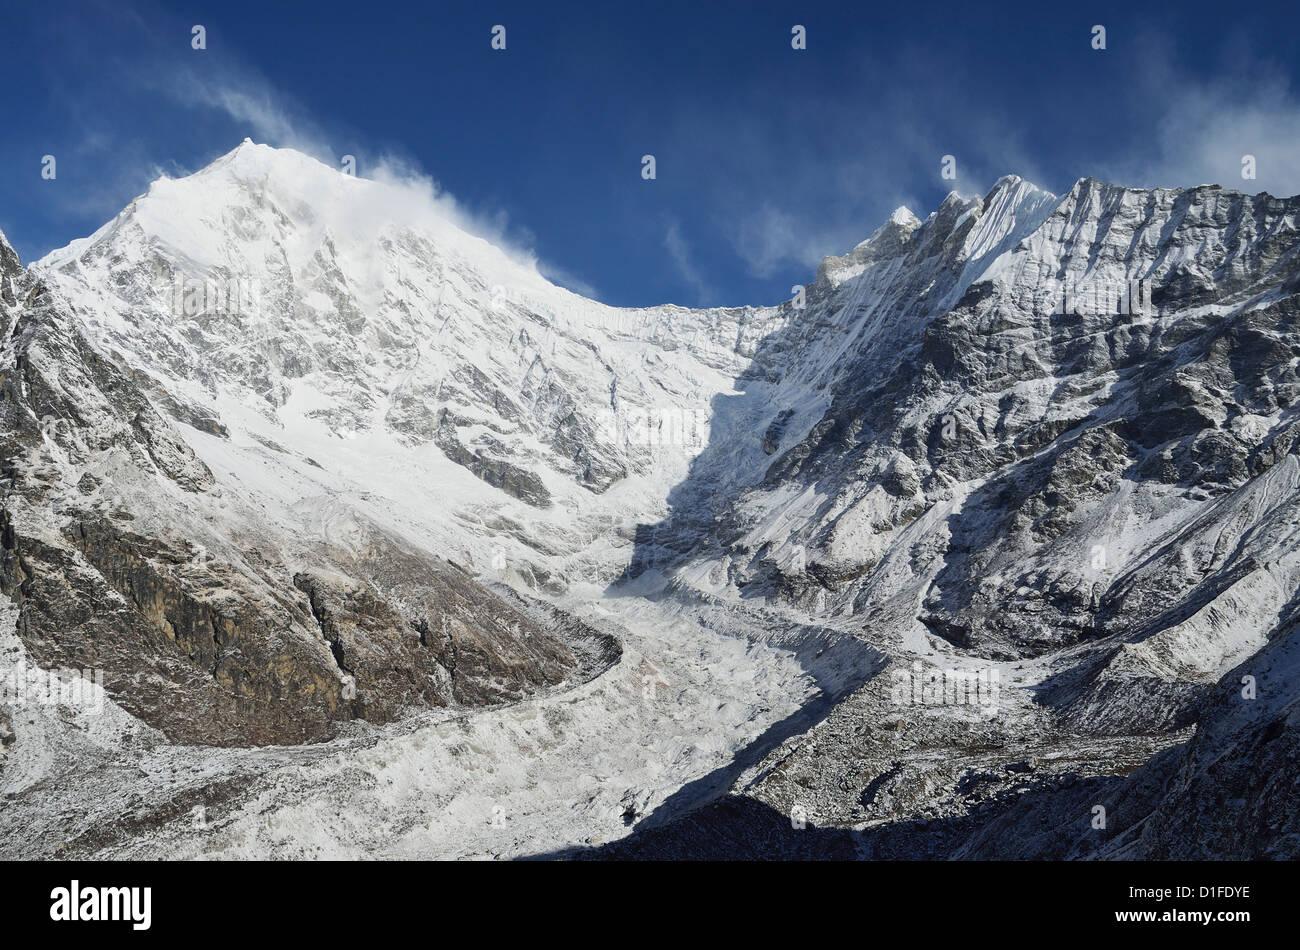 Langtang Lirung Glacier, Langtang National Park, Bagmati, Central Region (Madhyamanchal), Nepal, Himalayas, Asia - Stock Image